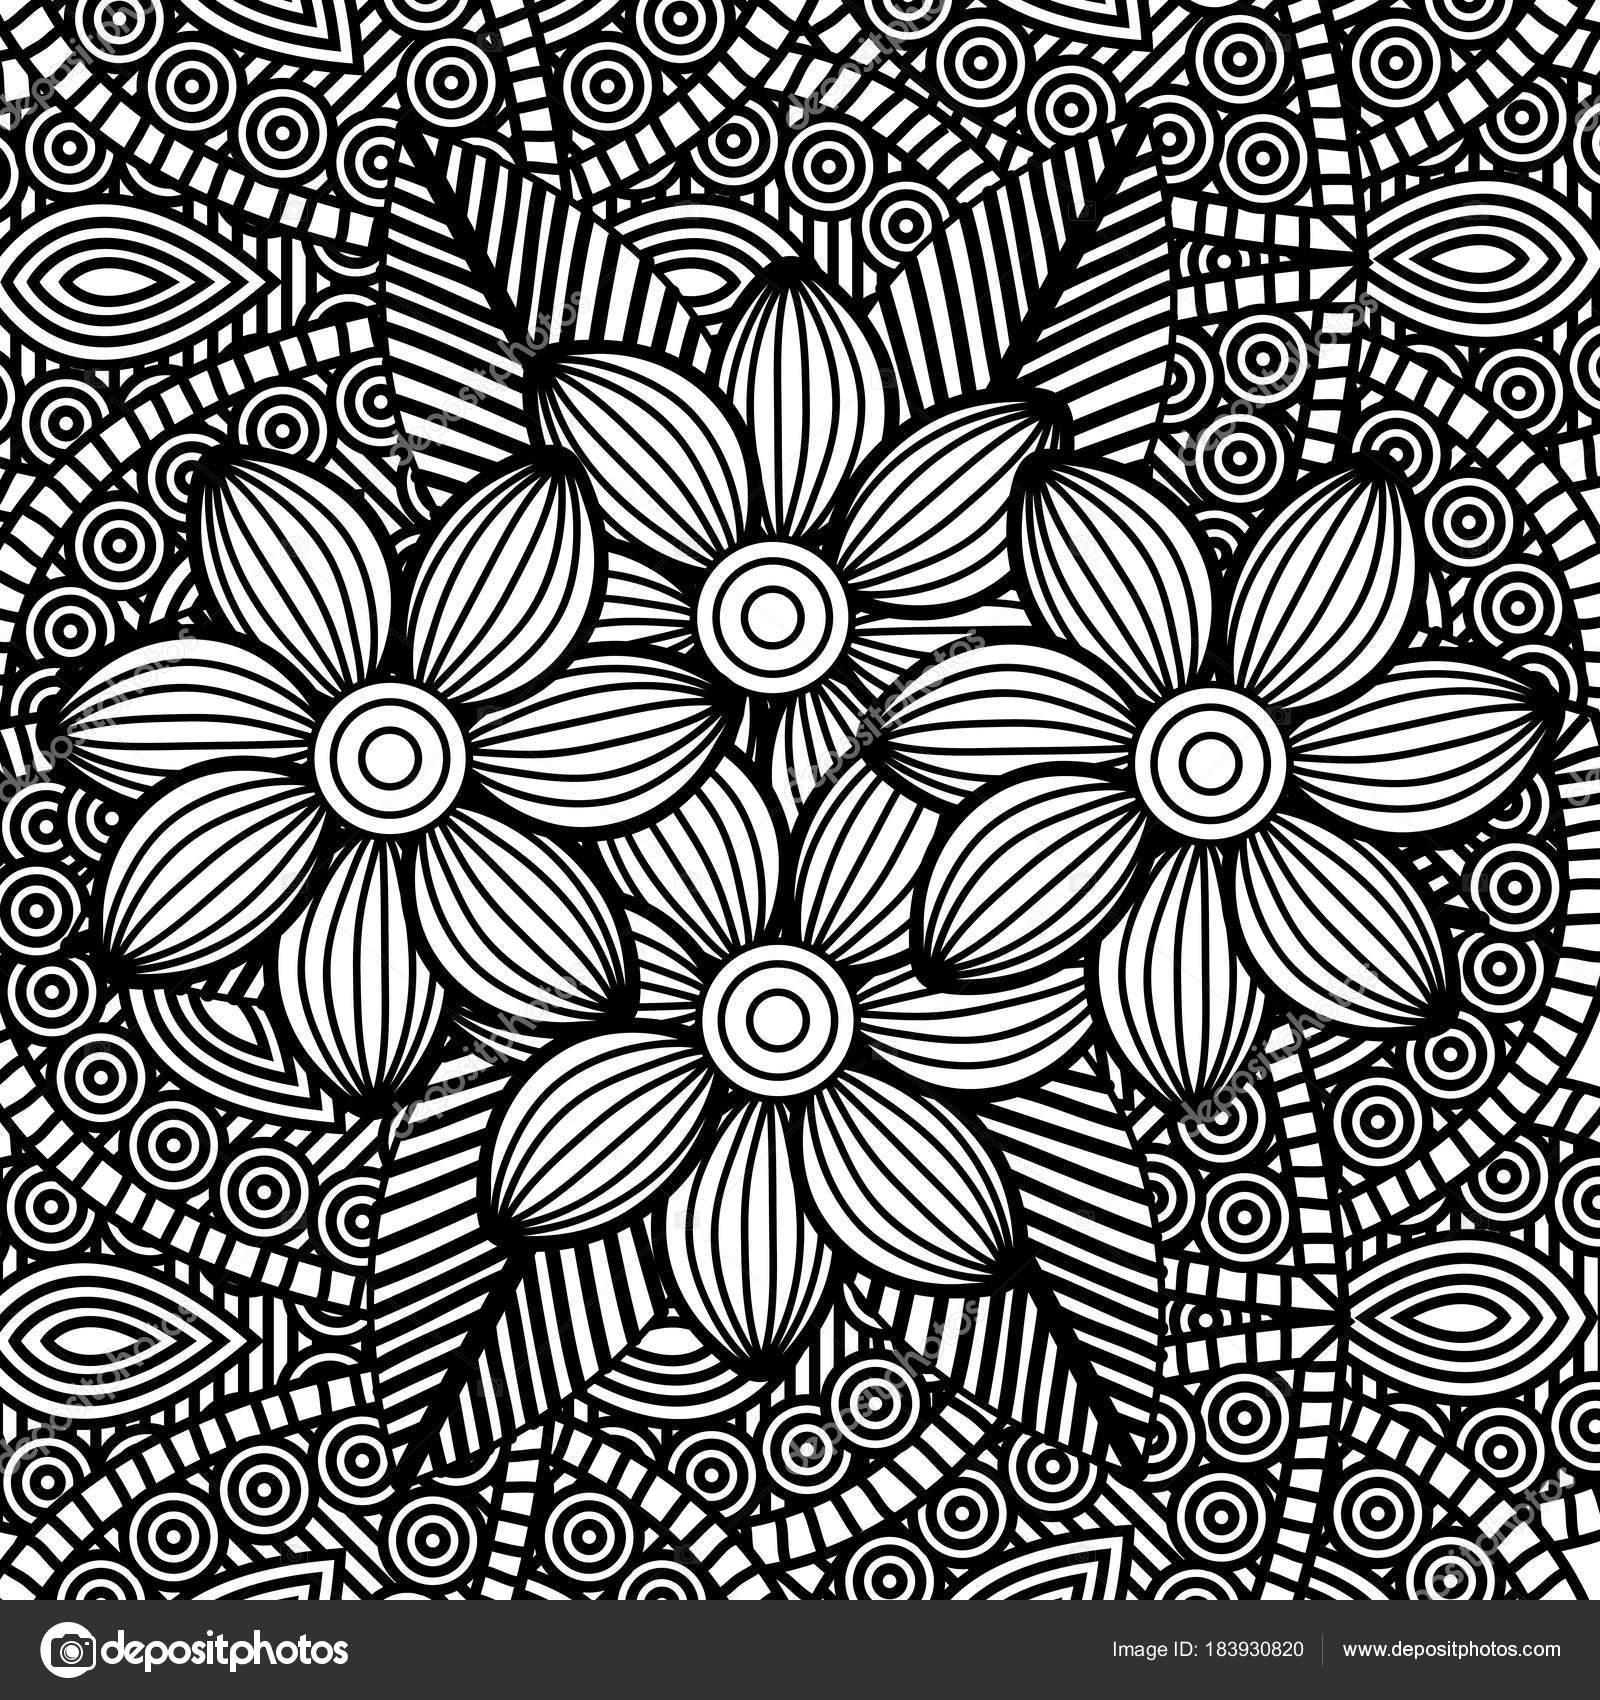 Dibujos Flores Geometricas Adulto Para Colorear Monocromos Flores